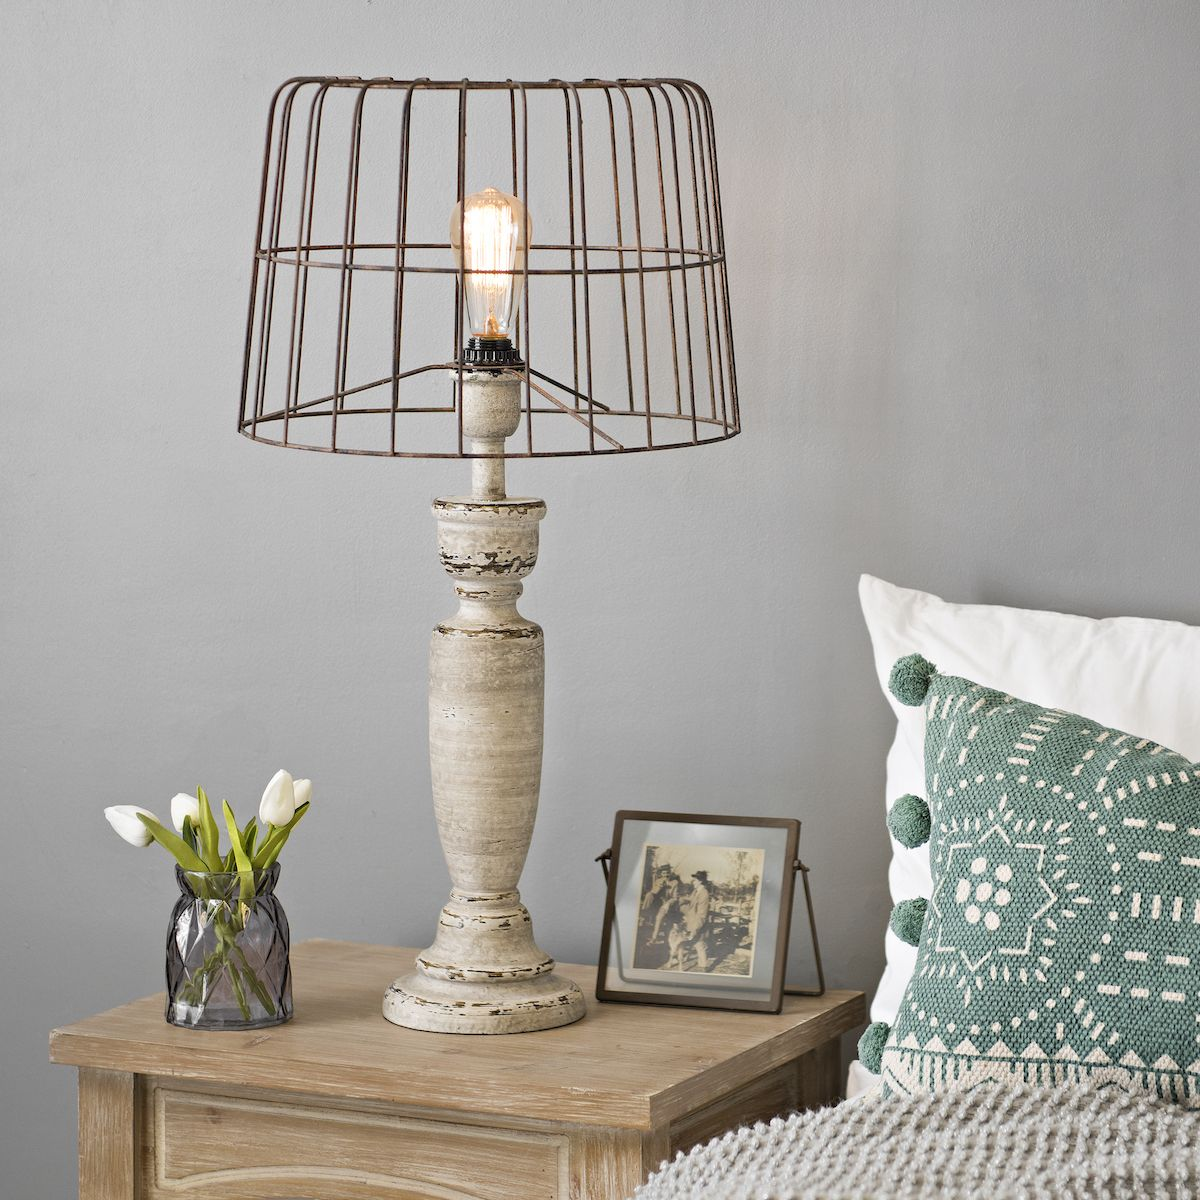 10 Best Vintage Living Room Lamps